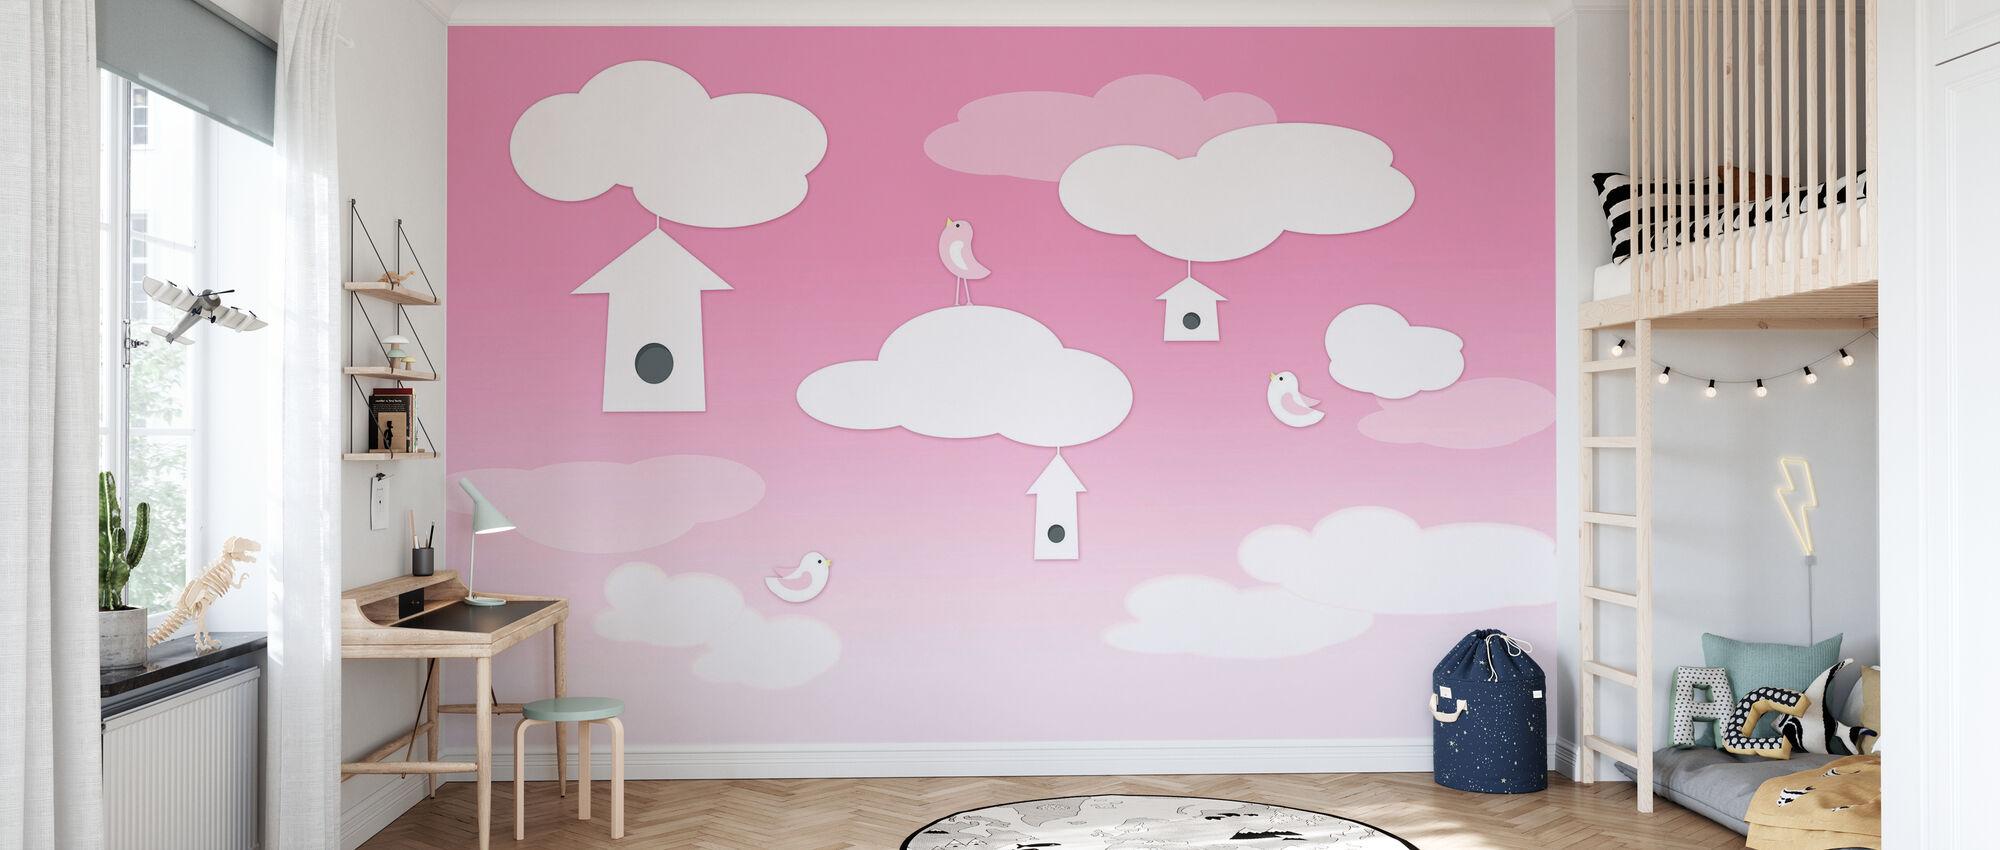 Vögel hoch - Rosa - Tapete - Kinderzimmer